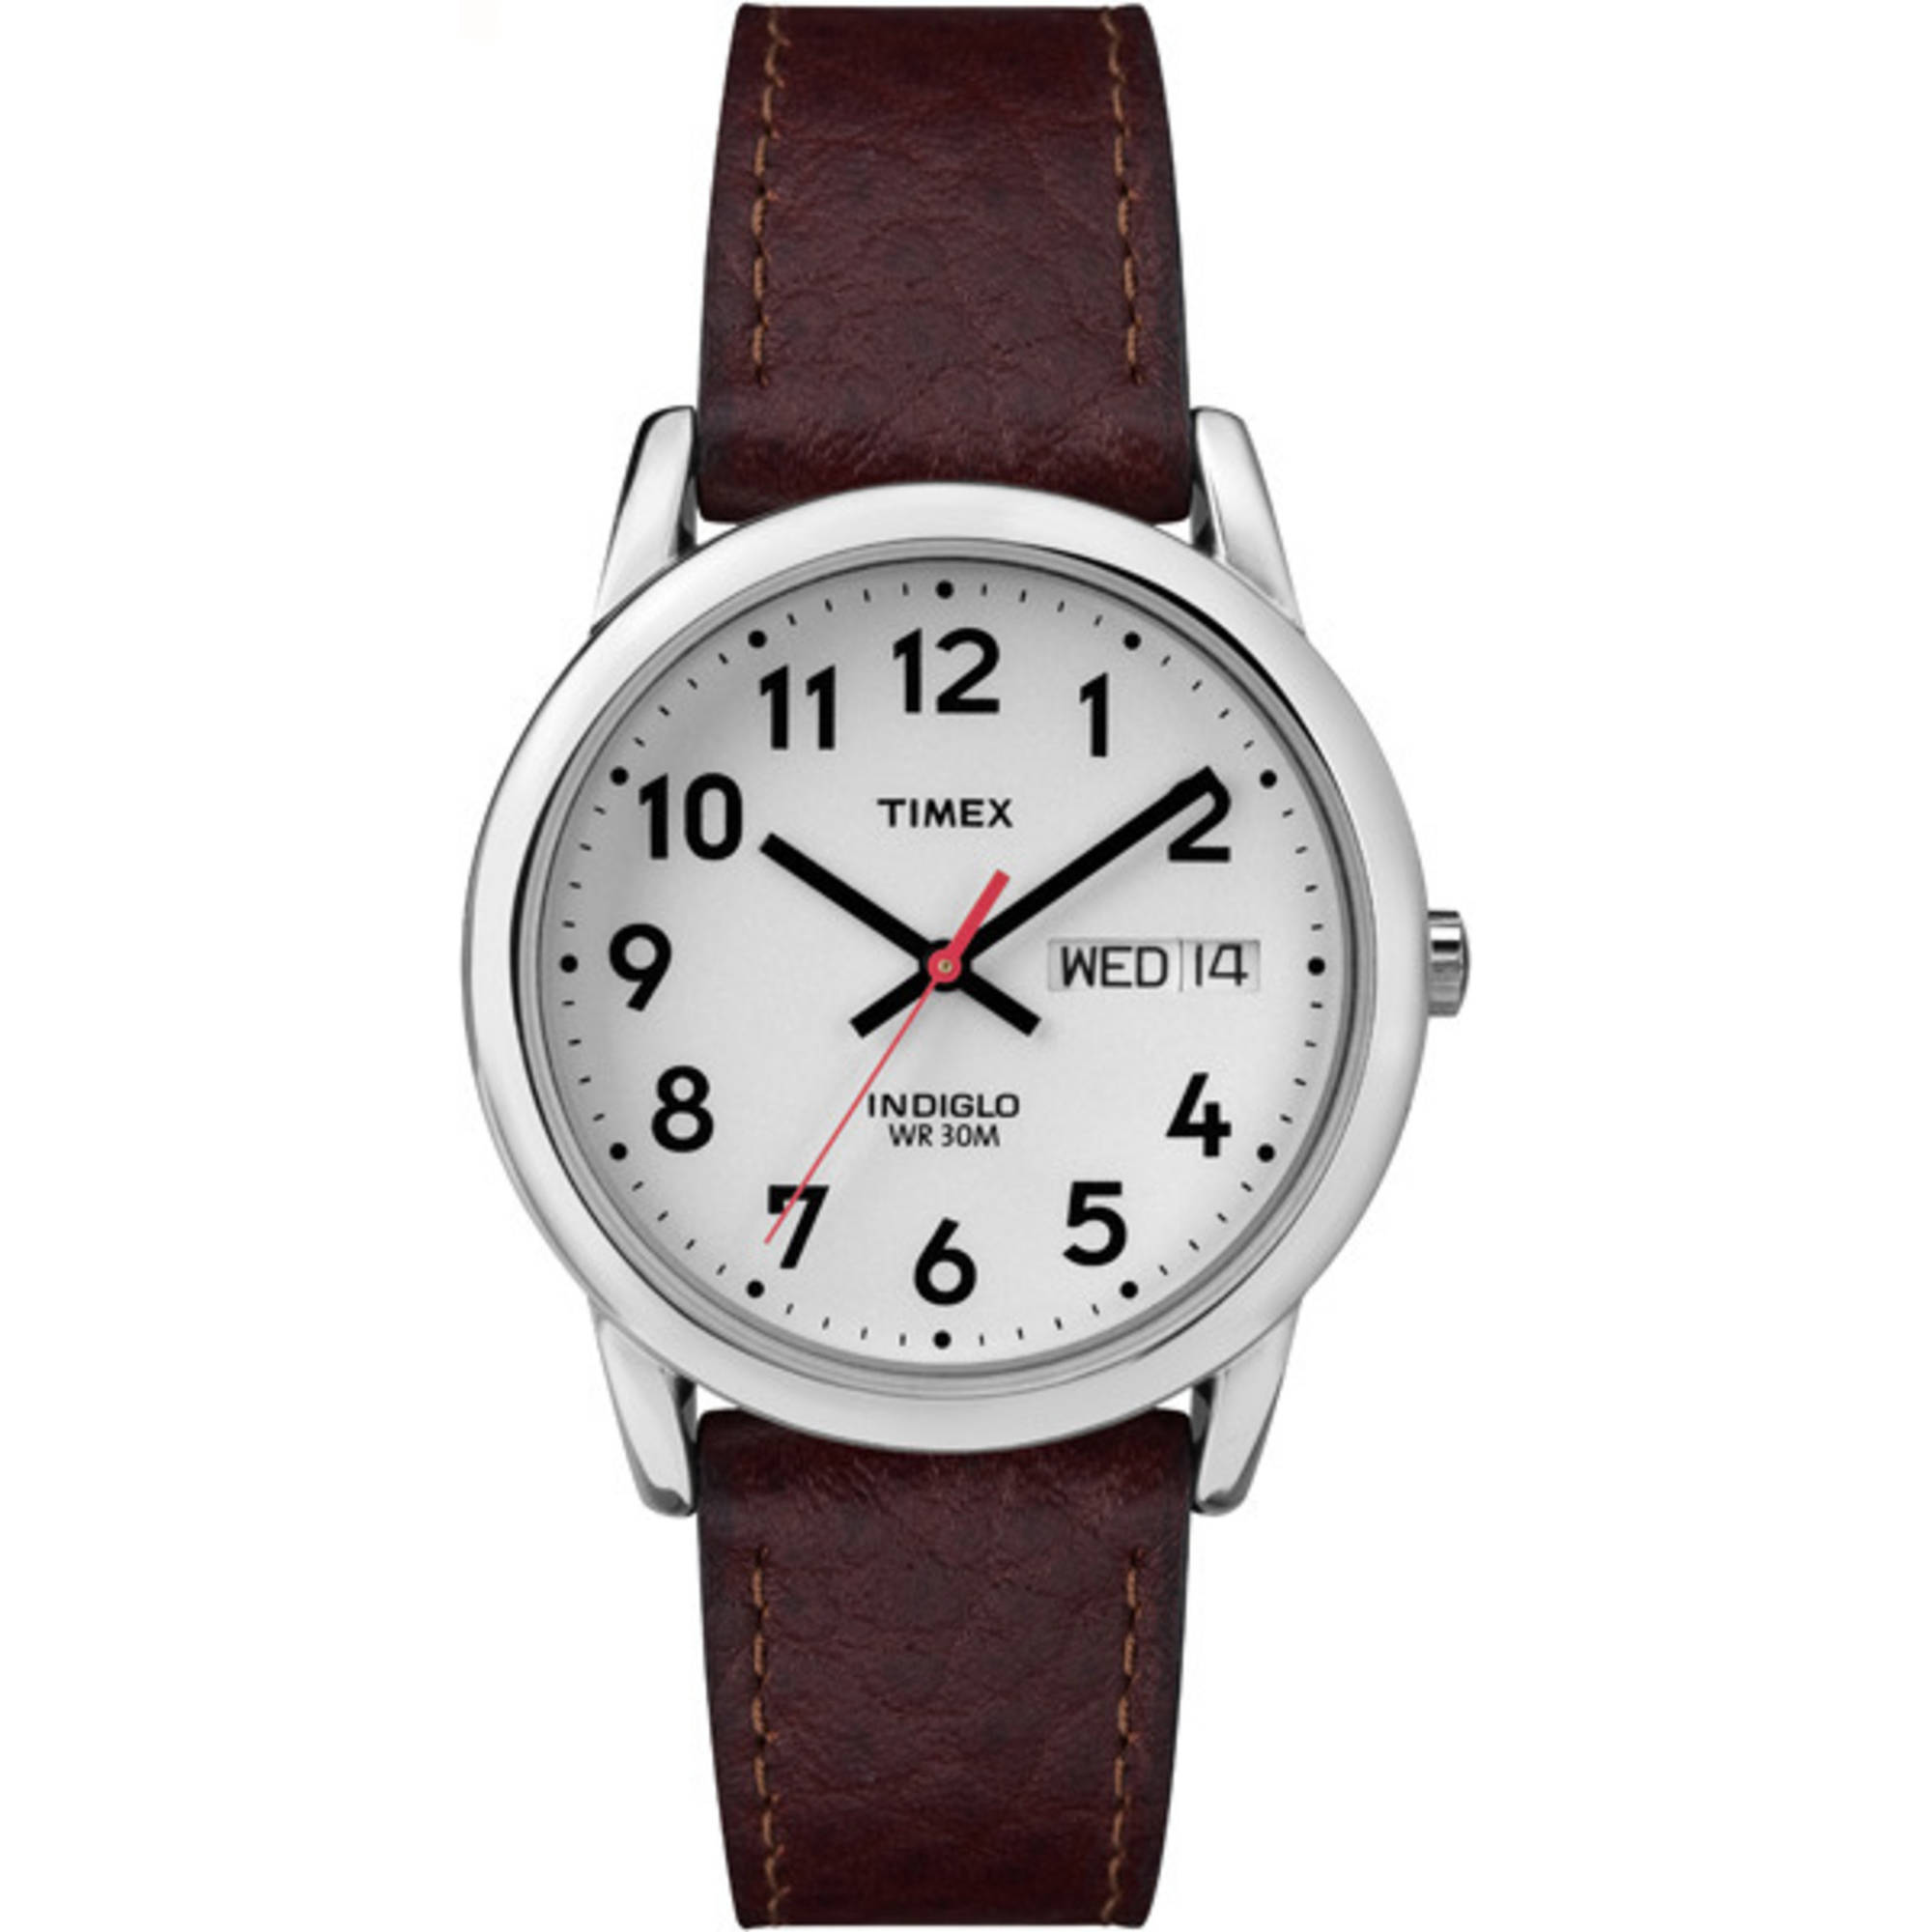 Timex Men's Easy Reader Watch, Brown Textured Leather Strap